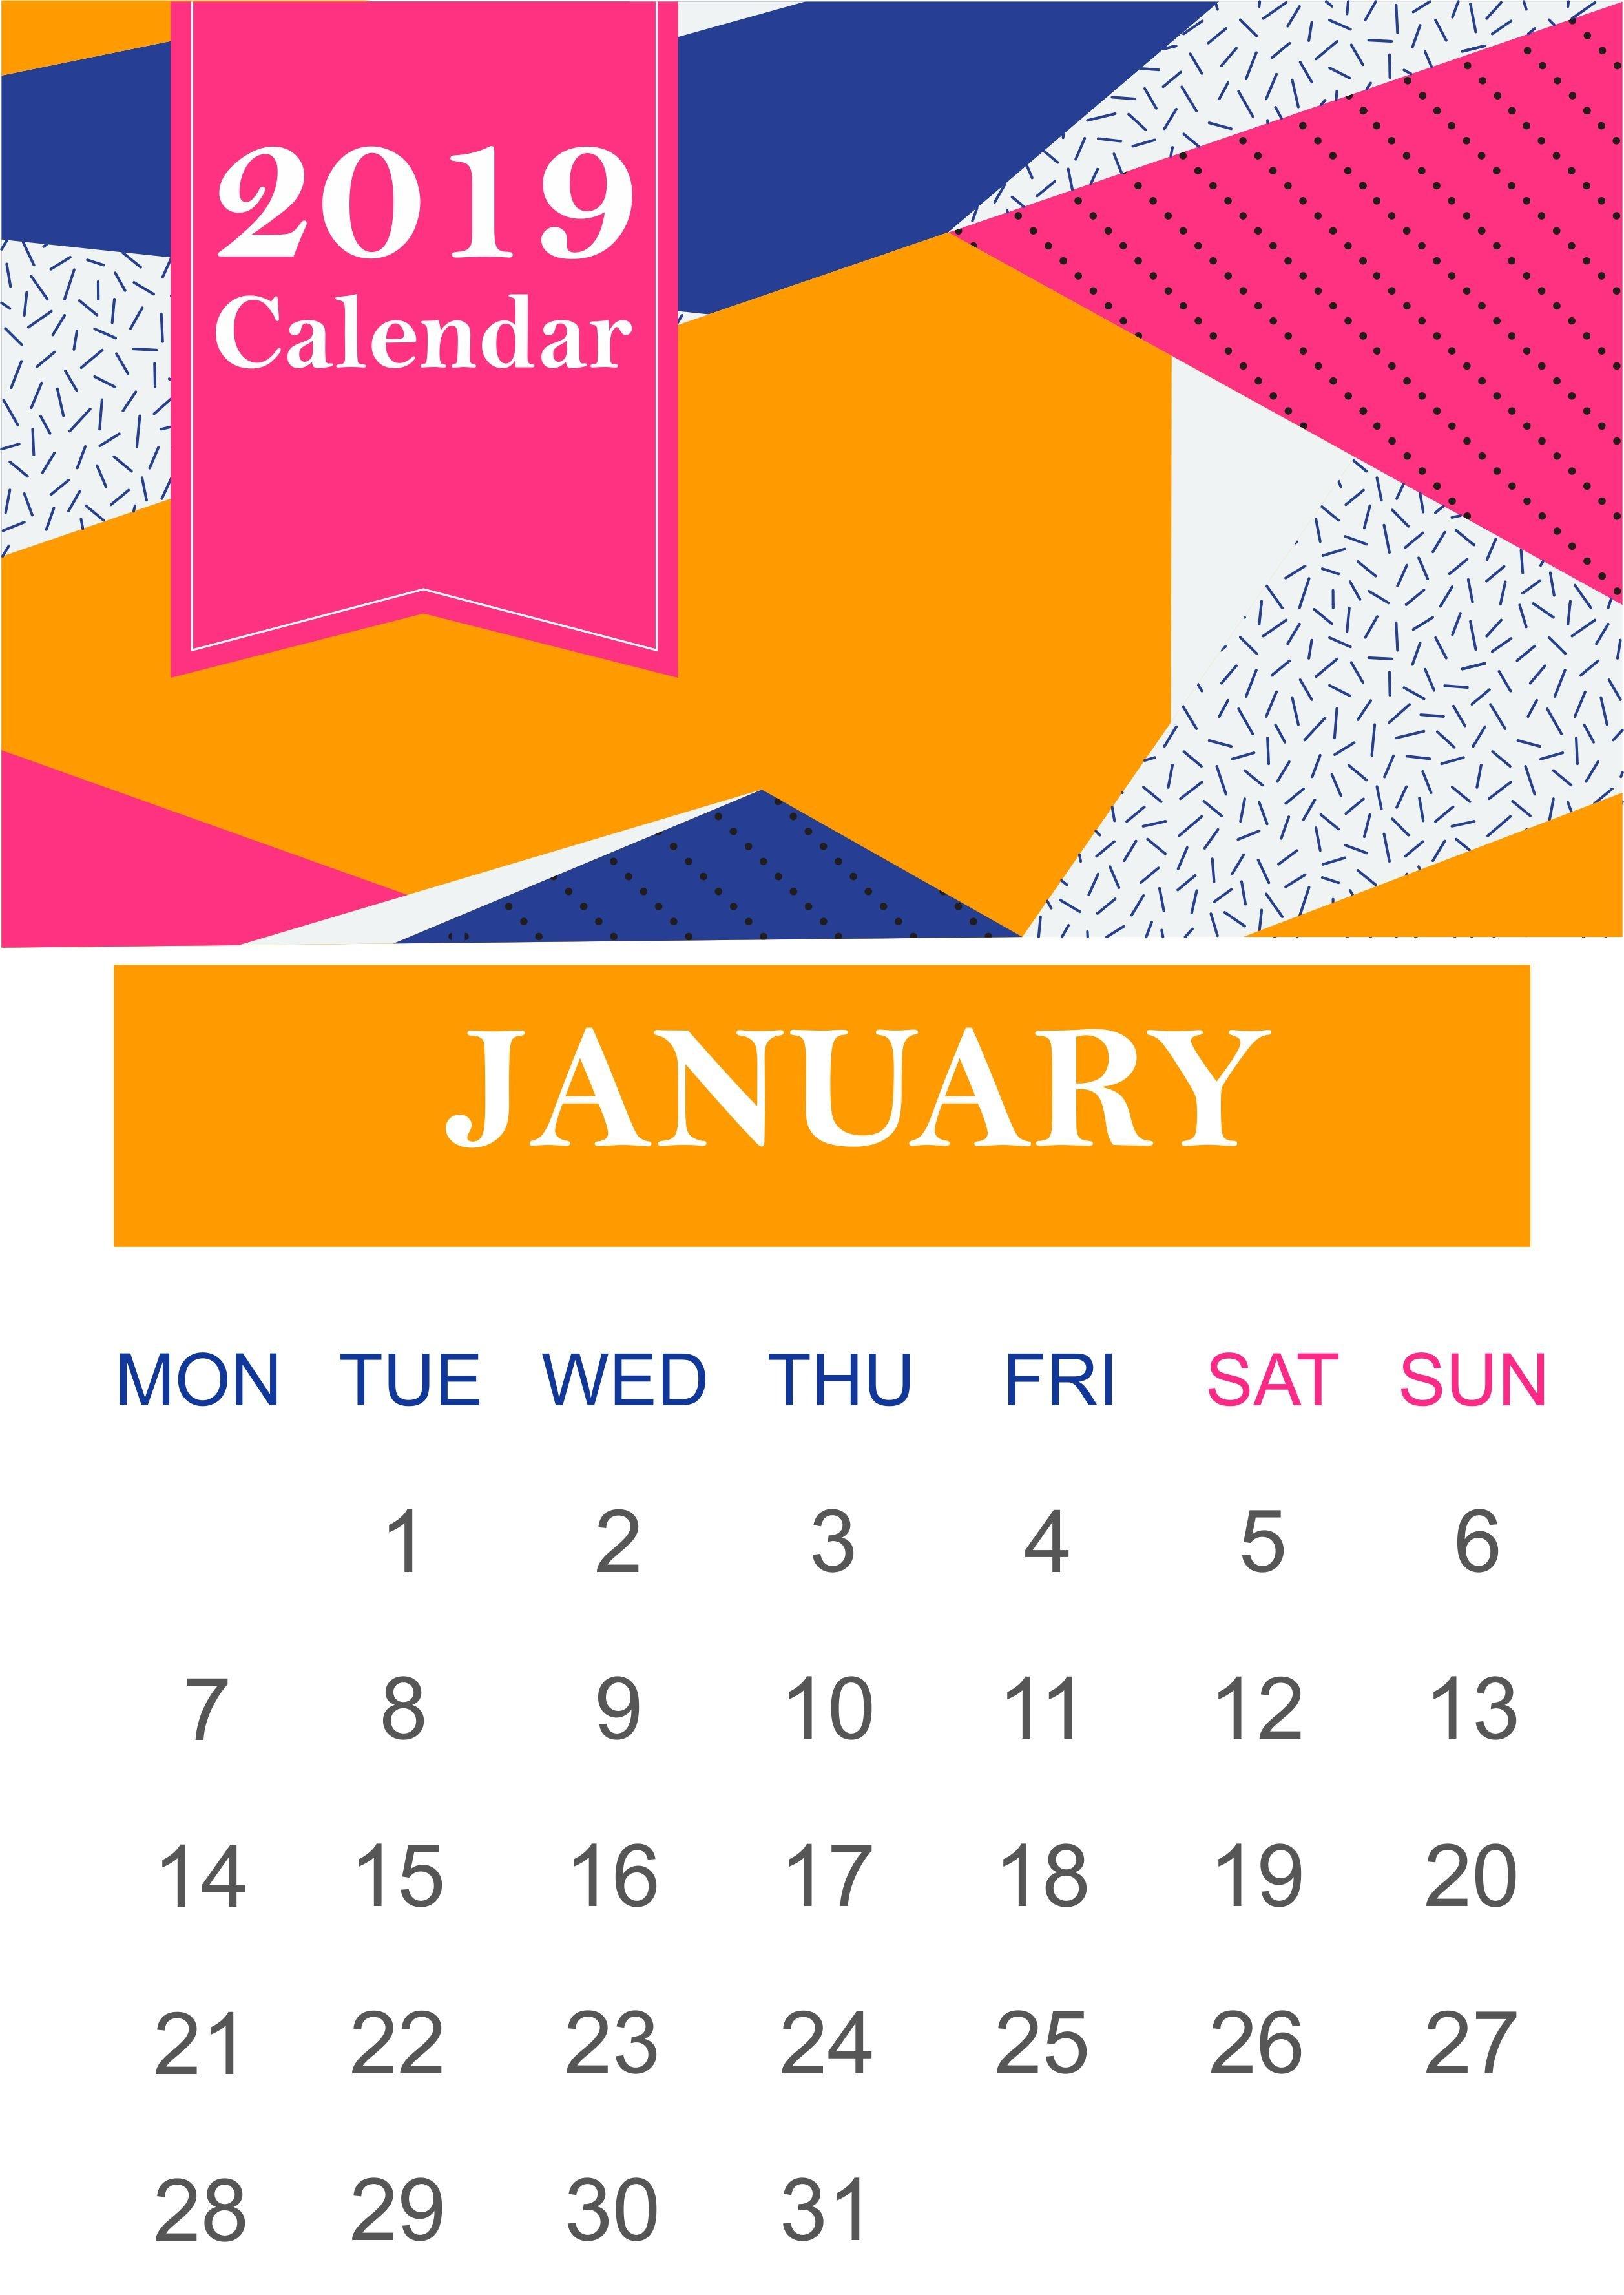 Free Sample Template Of January 2019 Calendar Pdf Excel Wordjanuary January 6 2019 Calendar